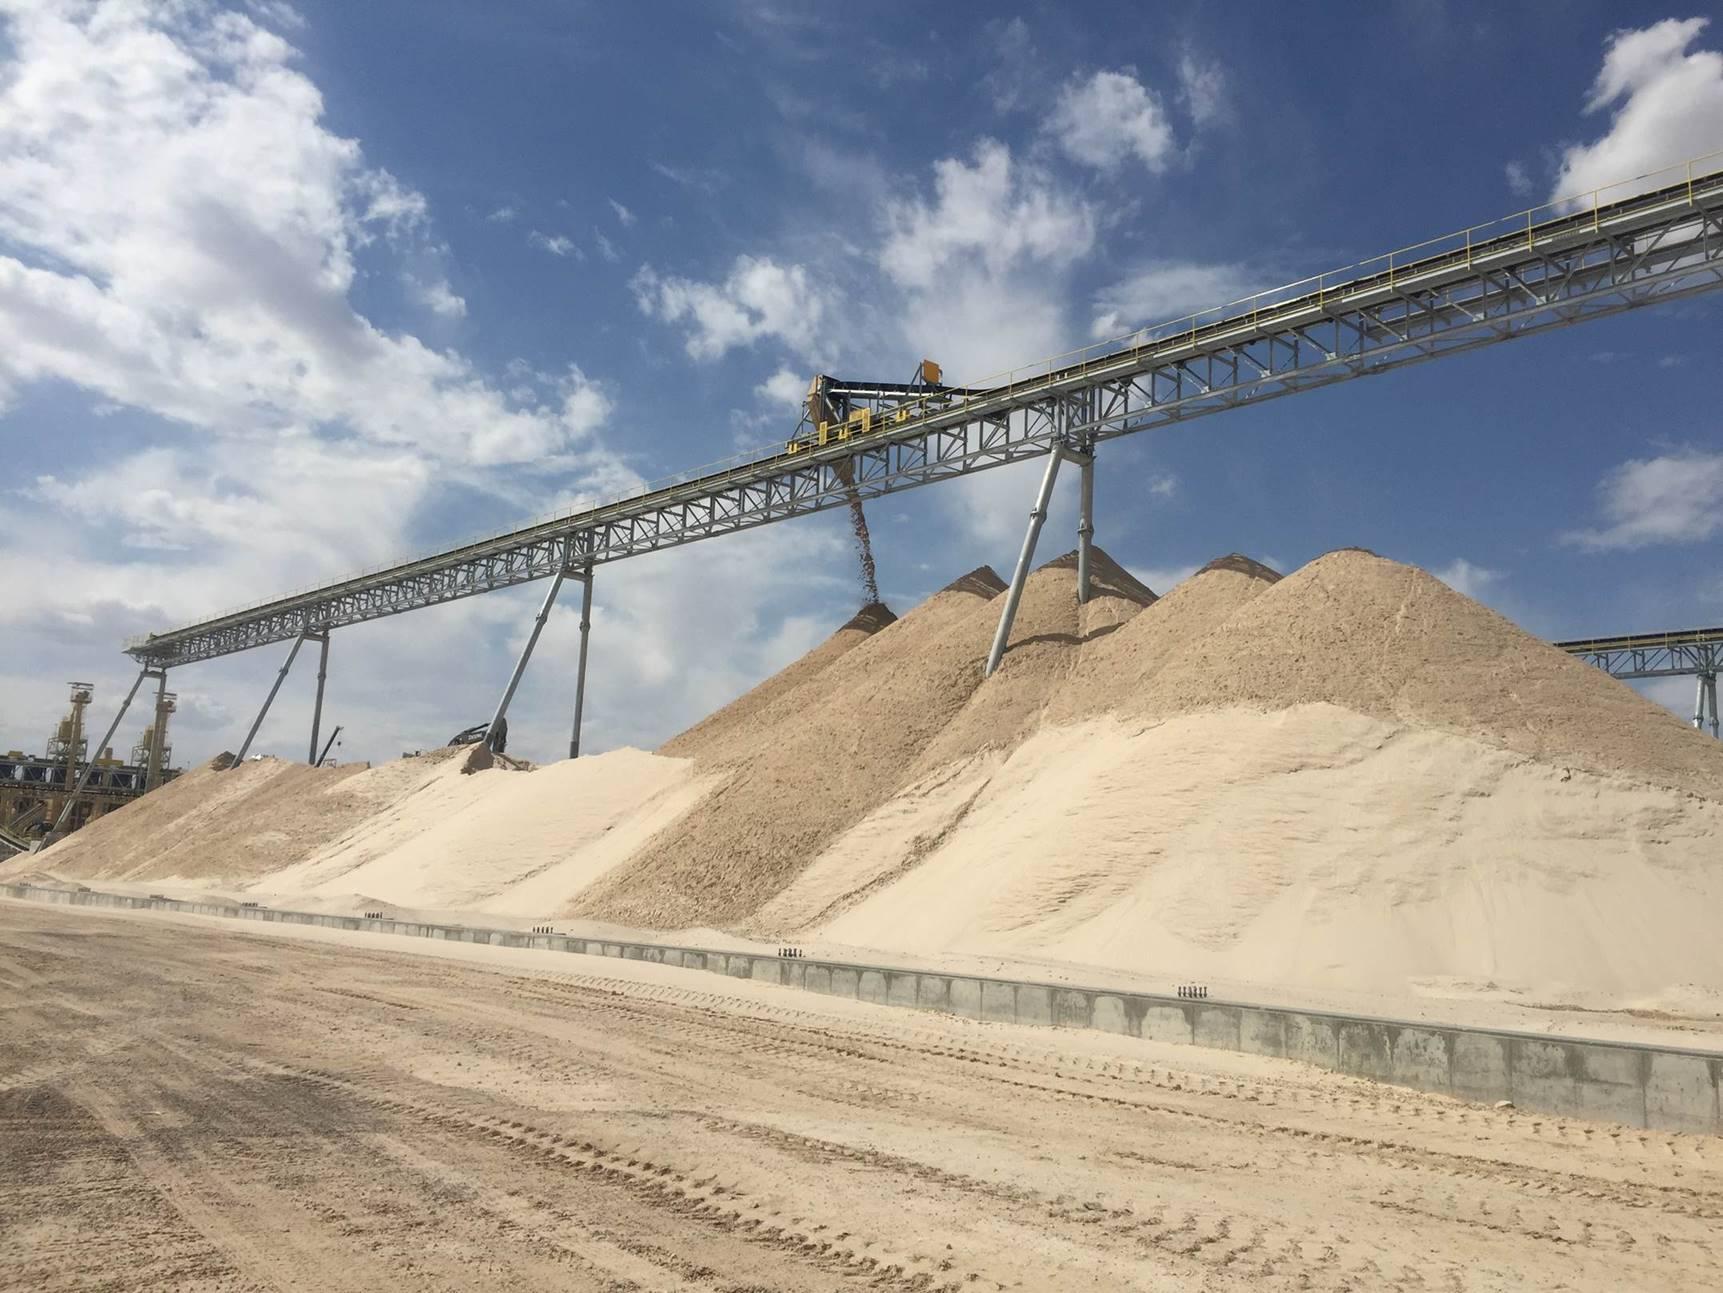 Frac Sand mining at the El Dorado Mine in the Permian Basin